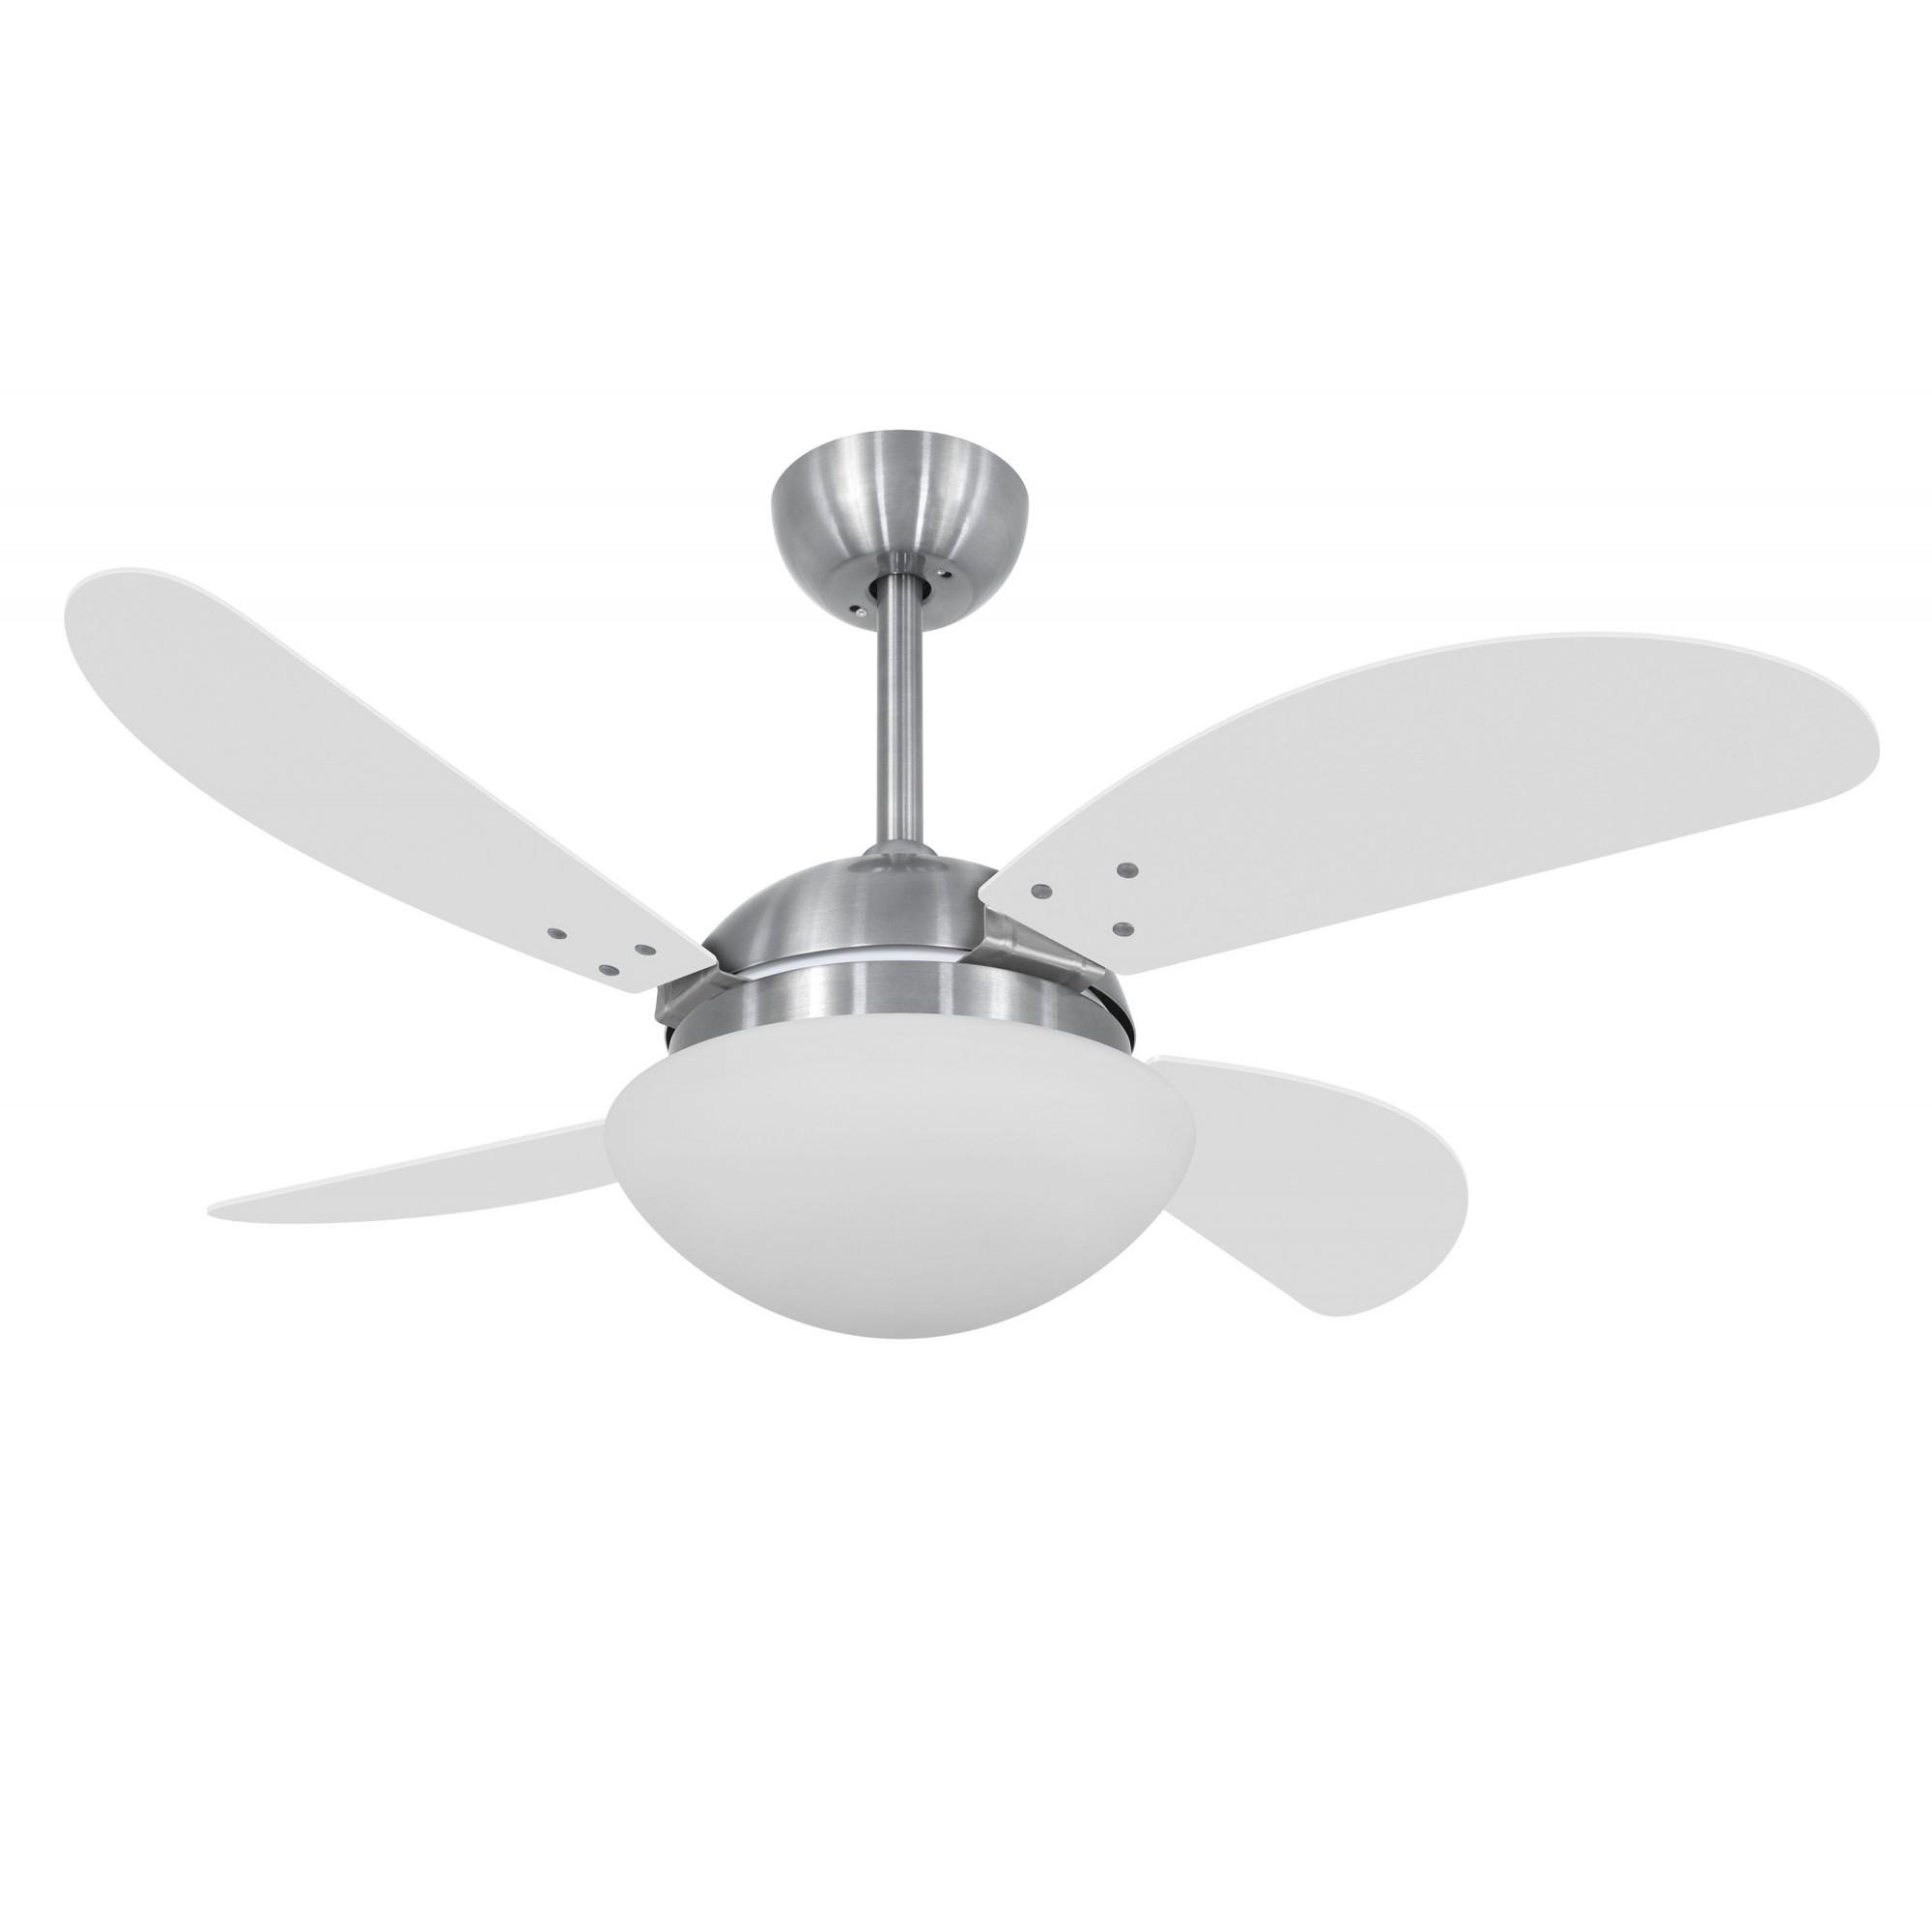 Ventilador de Teto VD42 Fly Prata 4 Pás MDF Branco 110V